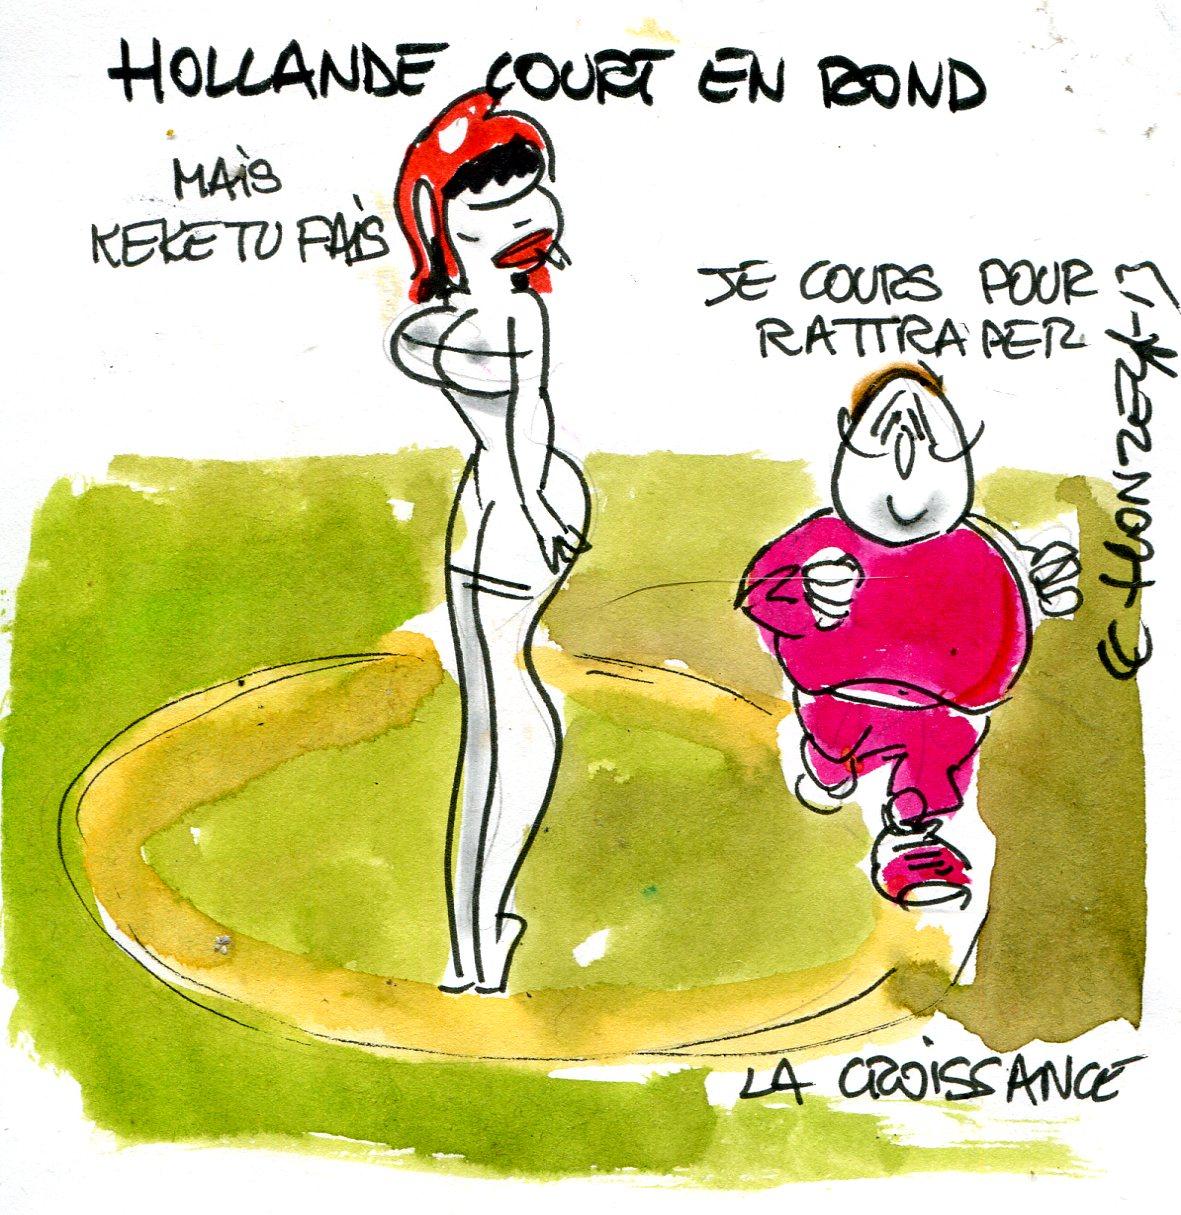 Conférence de presse : Hollande tourne en rond